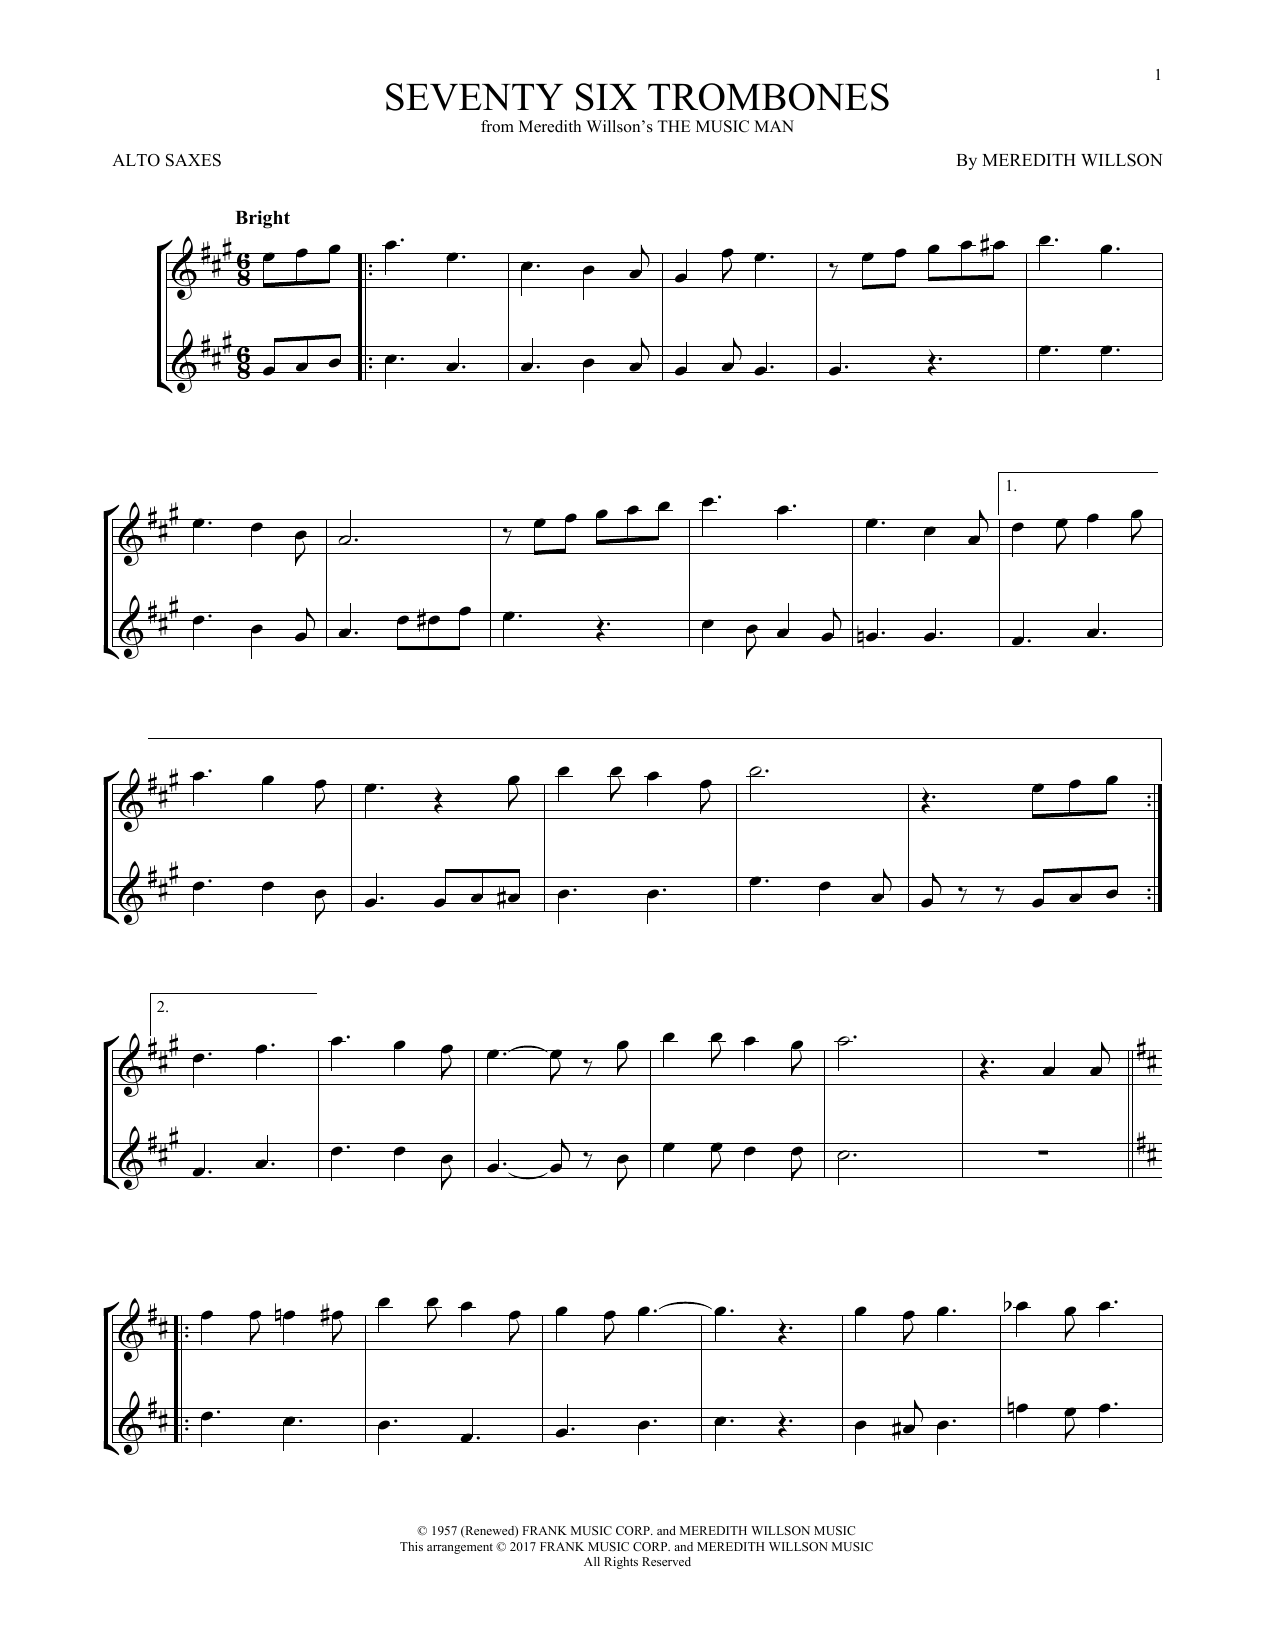 Seventy Six Trombones (Alto Sax Duet)